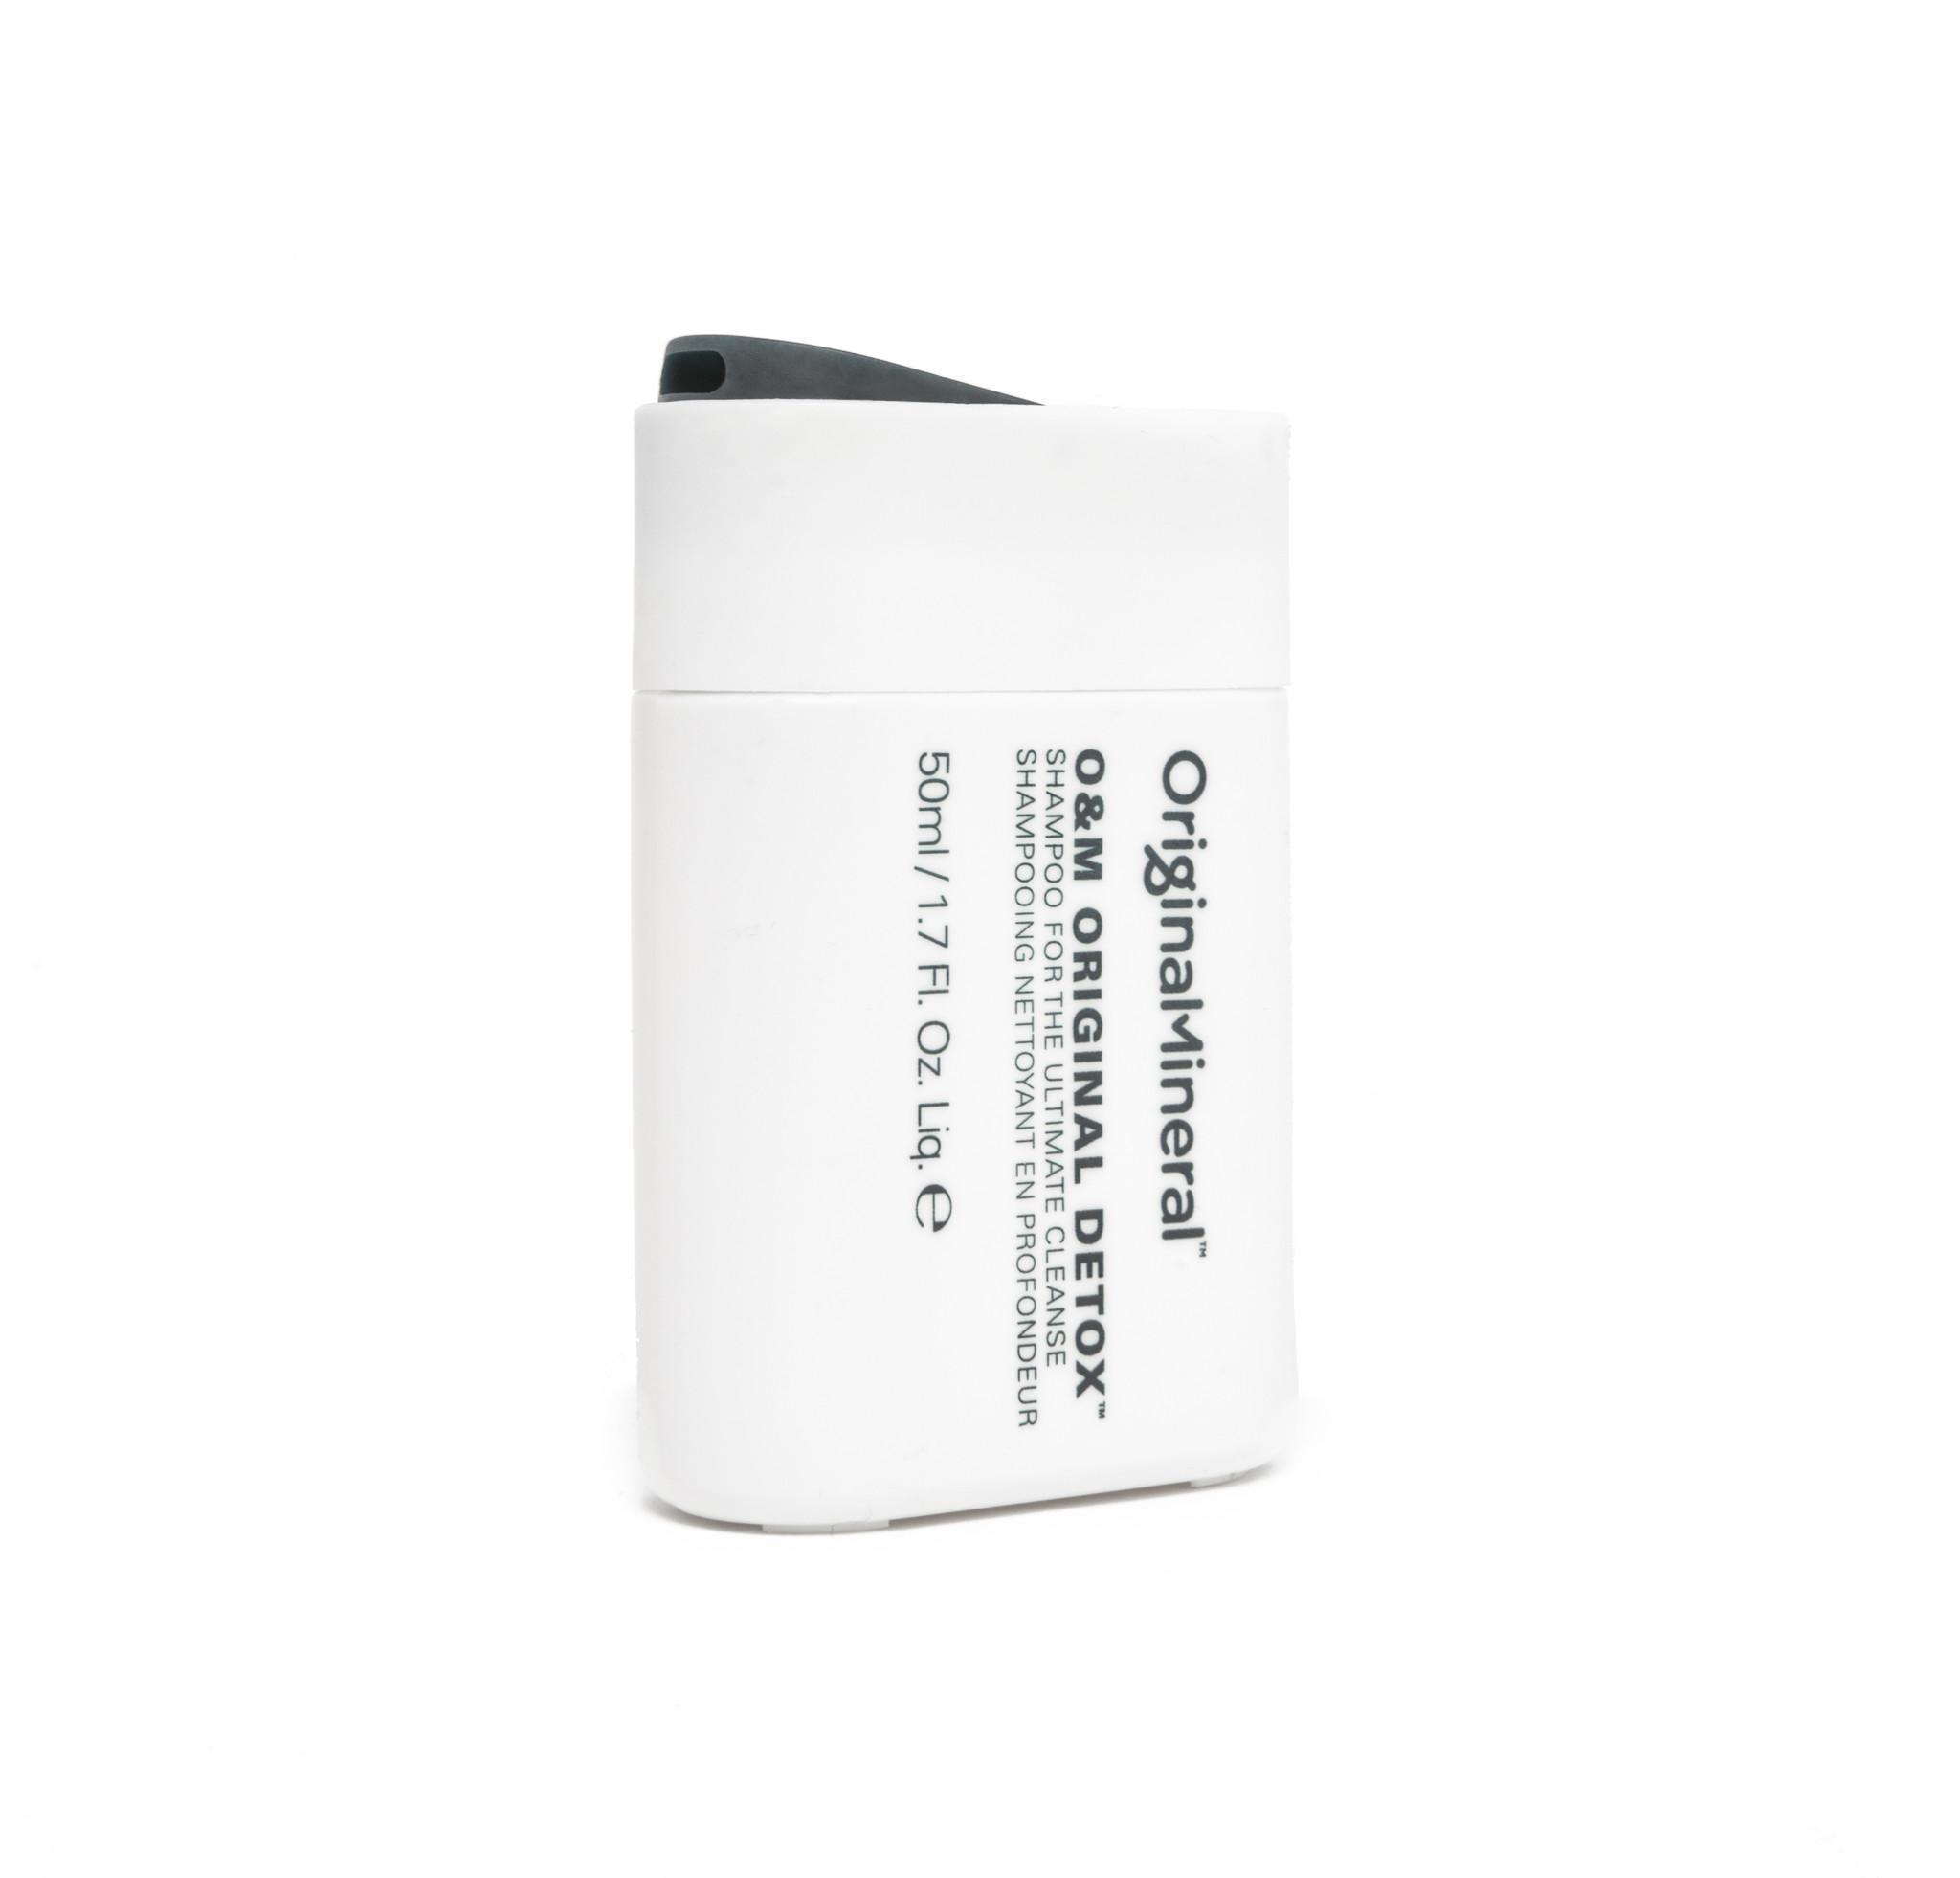 O&M - Original Mineral O&M Original Detox Shampooing nettoyant en profondeur 50ml